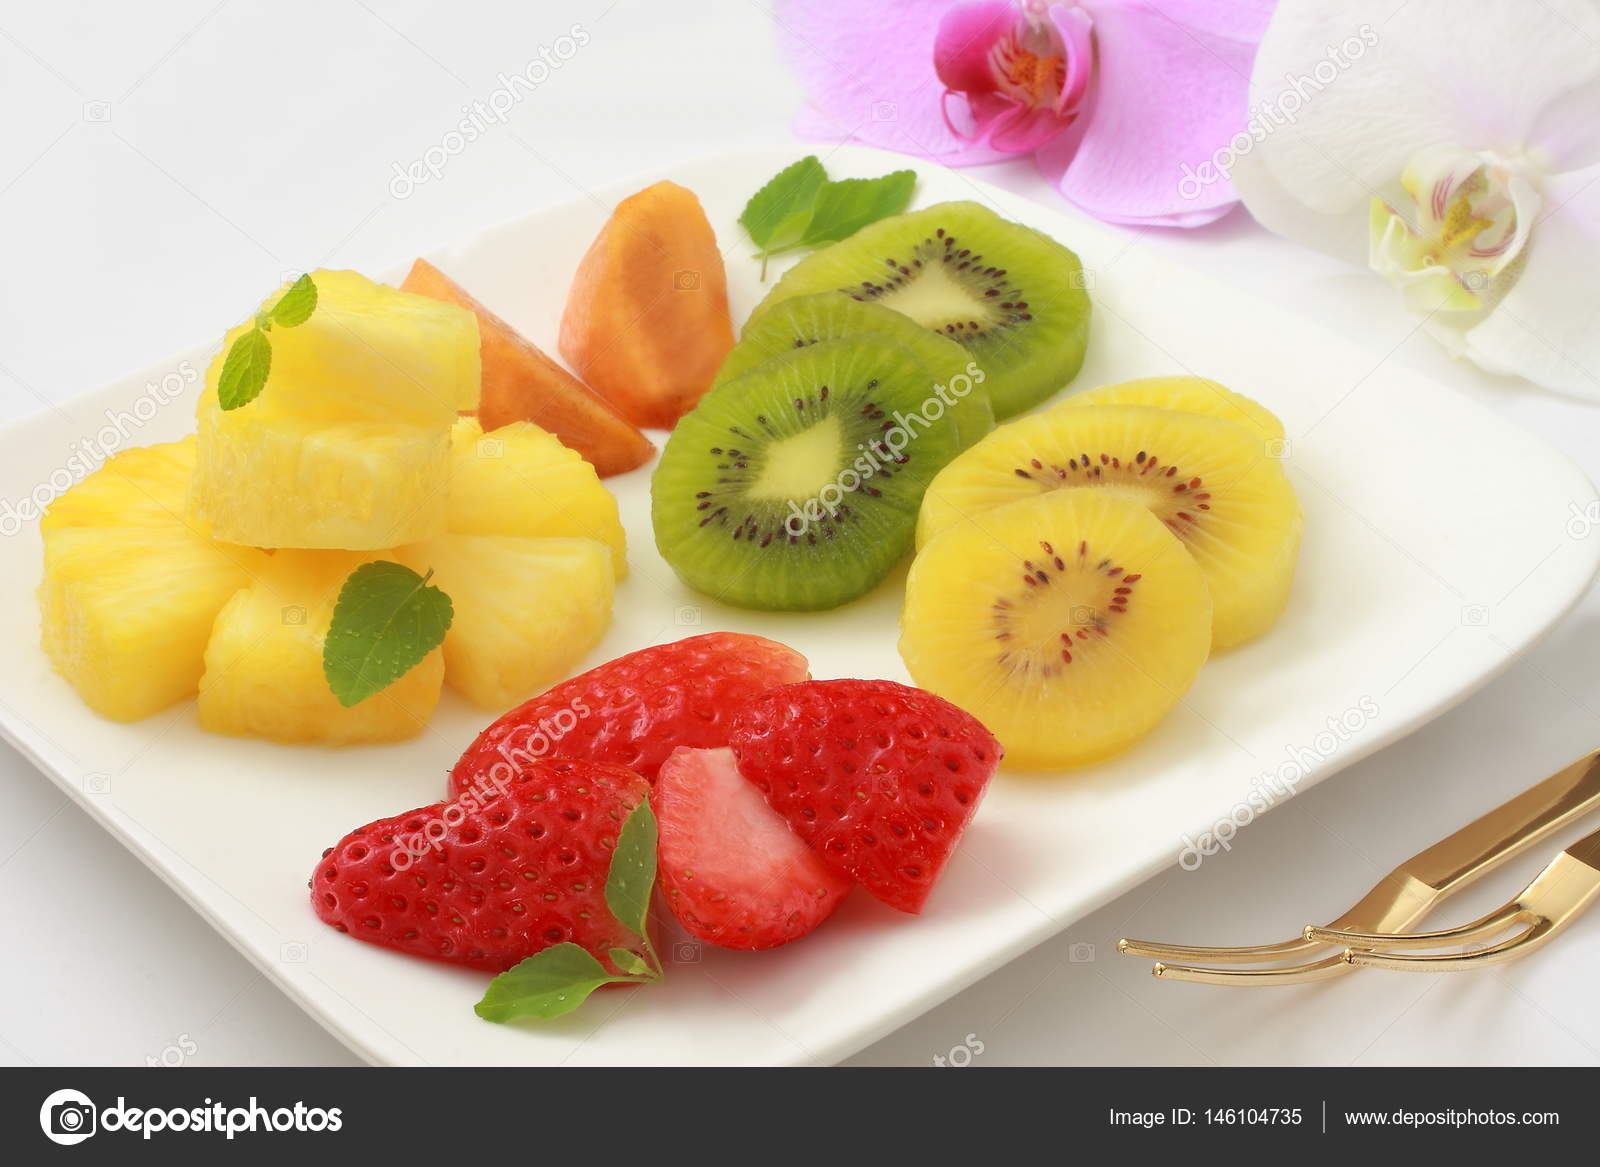 Hilo Chat para hablar de todo. - Página 3 Depositphotos_146104735-stock-photo-assorted-cut-fruits